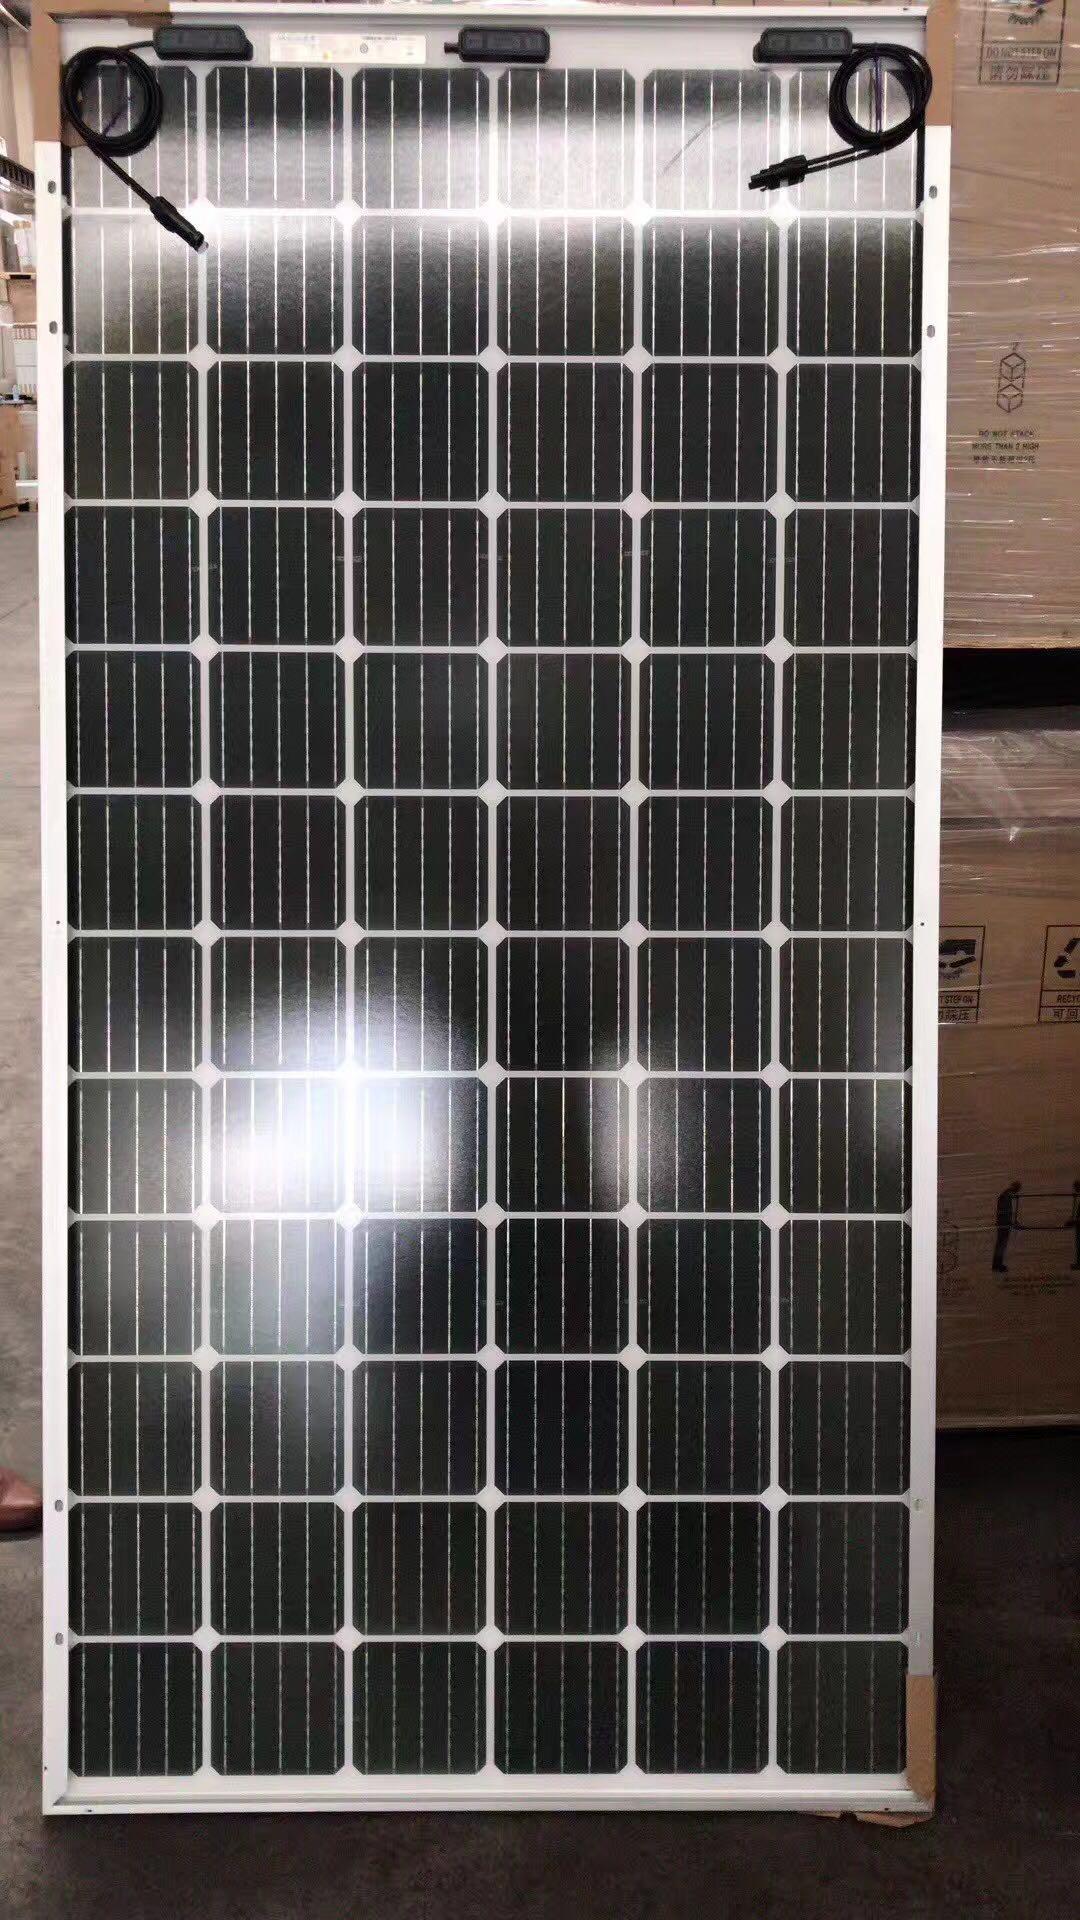 cheap price JA Longi 360W,365W 370W,375W,380W Bifacial Mono solar panels,  View JA Bifacial mono panel, LG Product Details from Shenzhen Dingjing